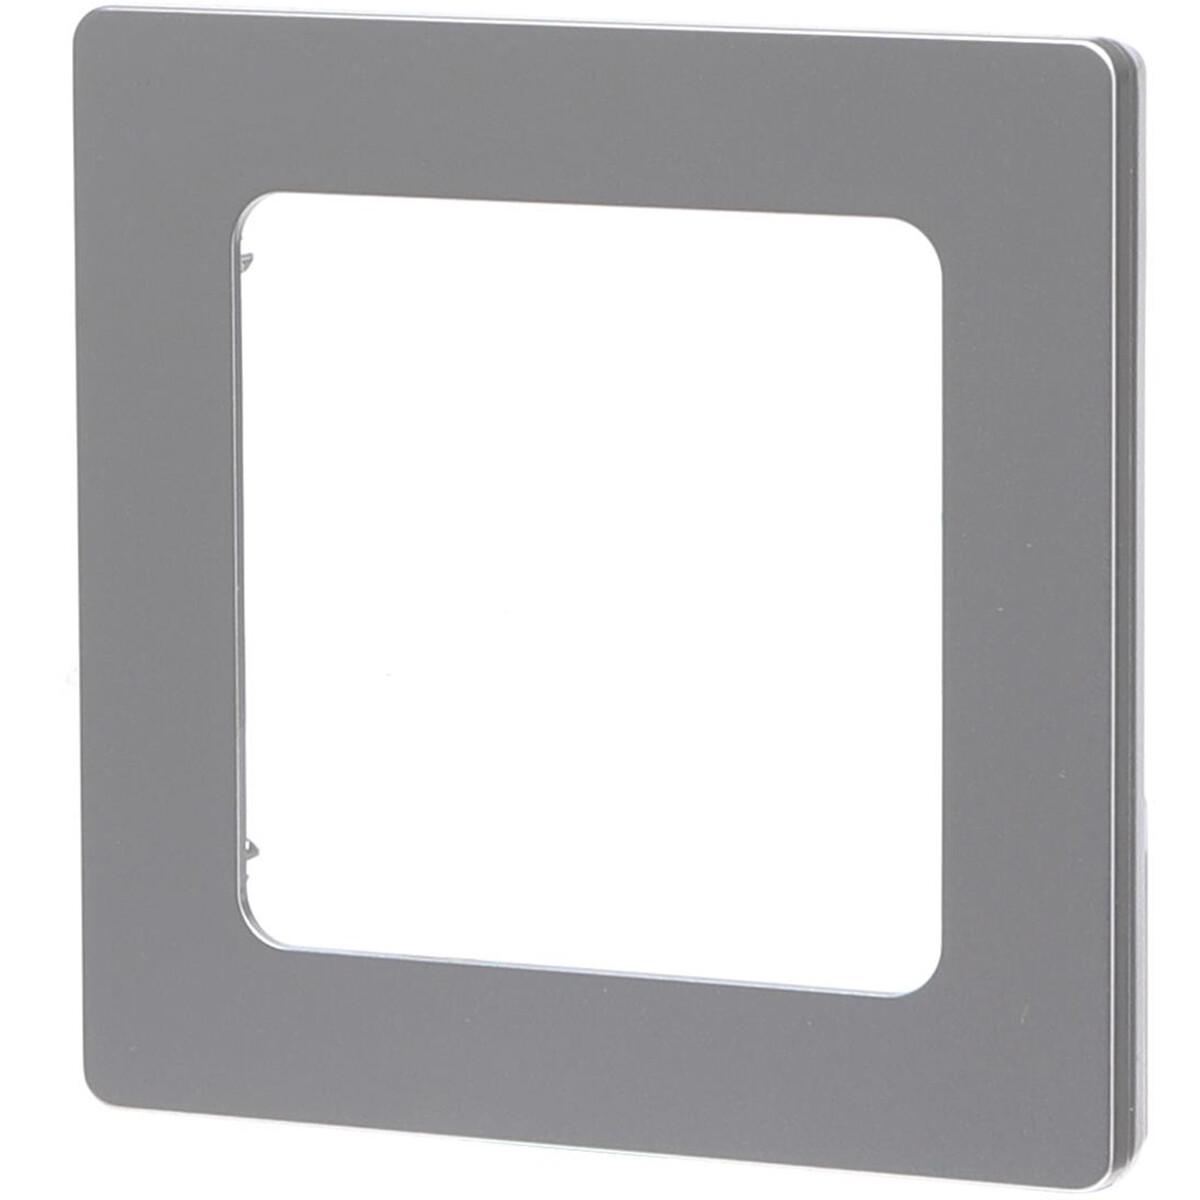 Afdekraam - Aigi Jura - 1-voudig - Vierkant - Kunststof - Zilver